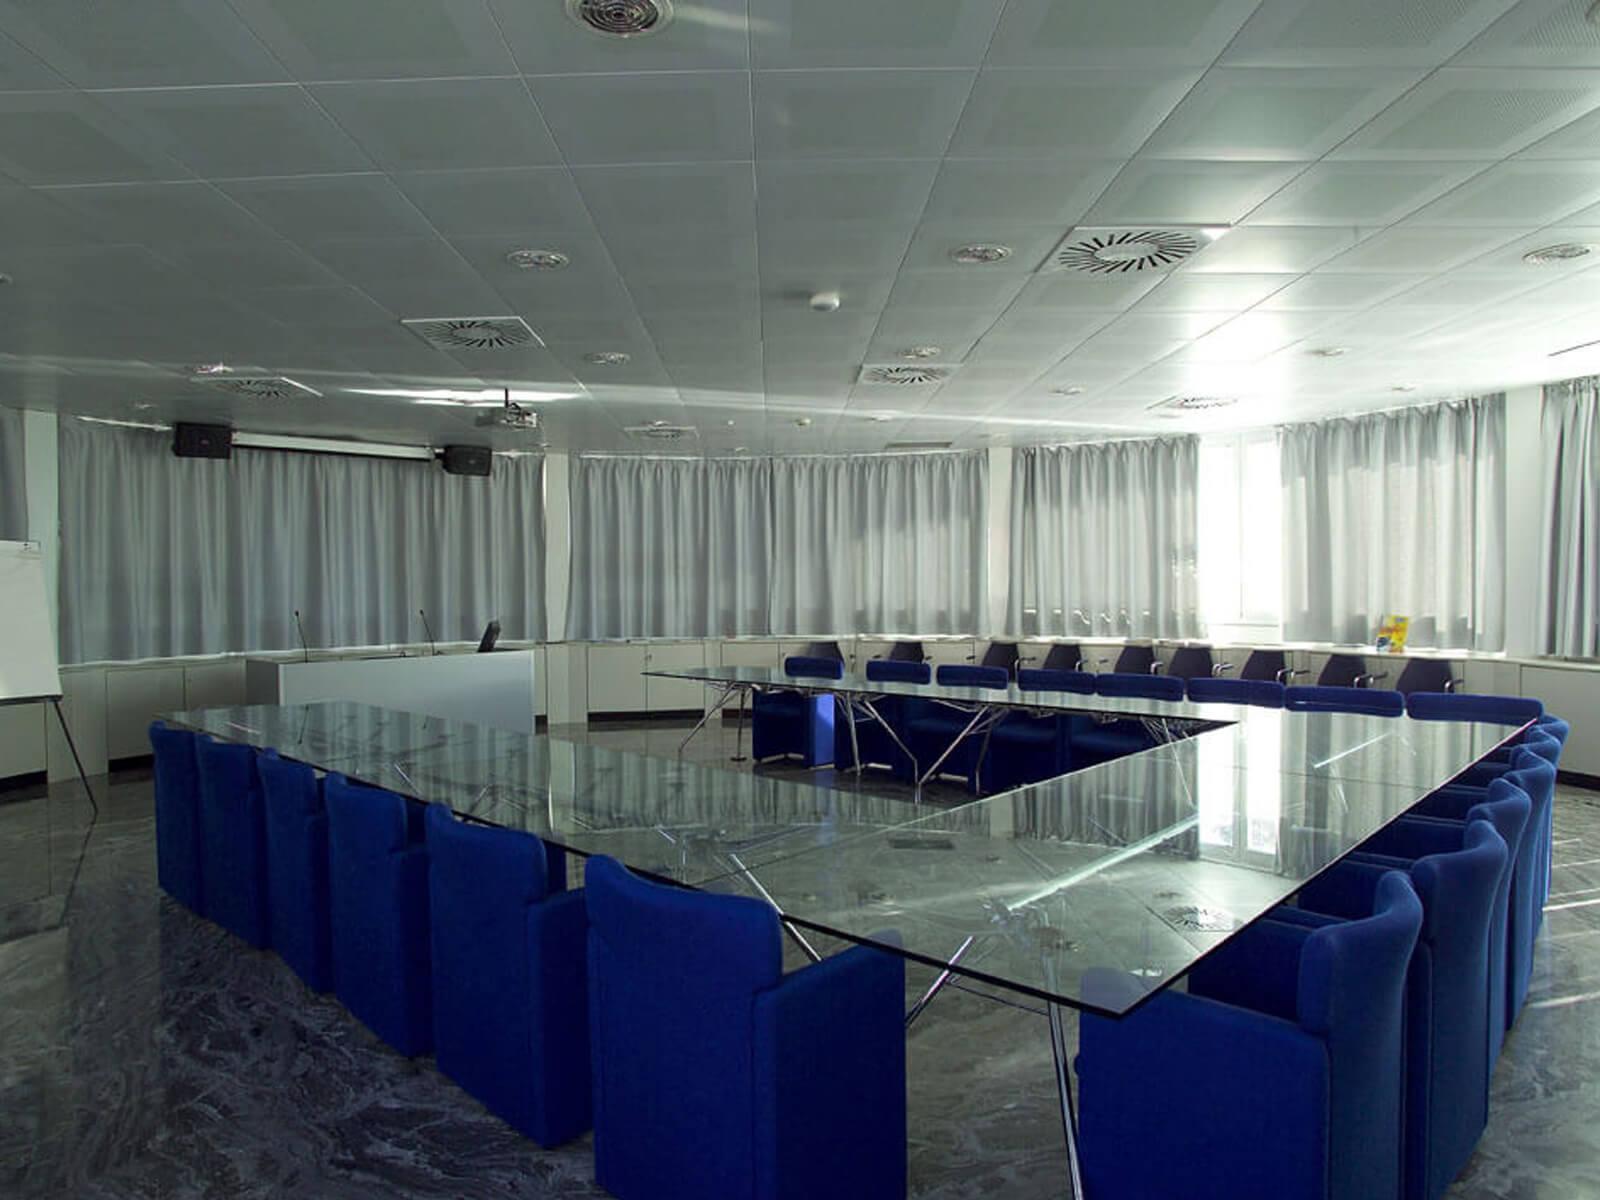 Sale conferenze e corsi a Bergamo: sala meeting